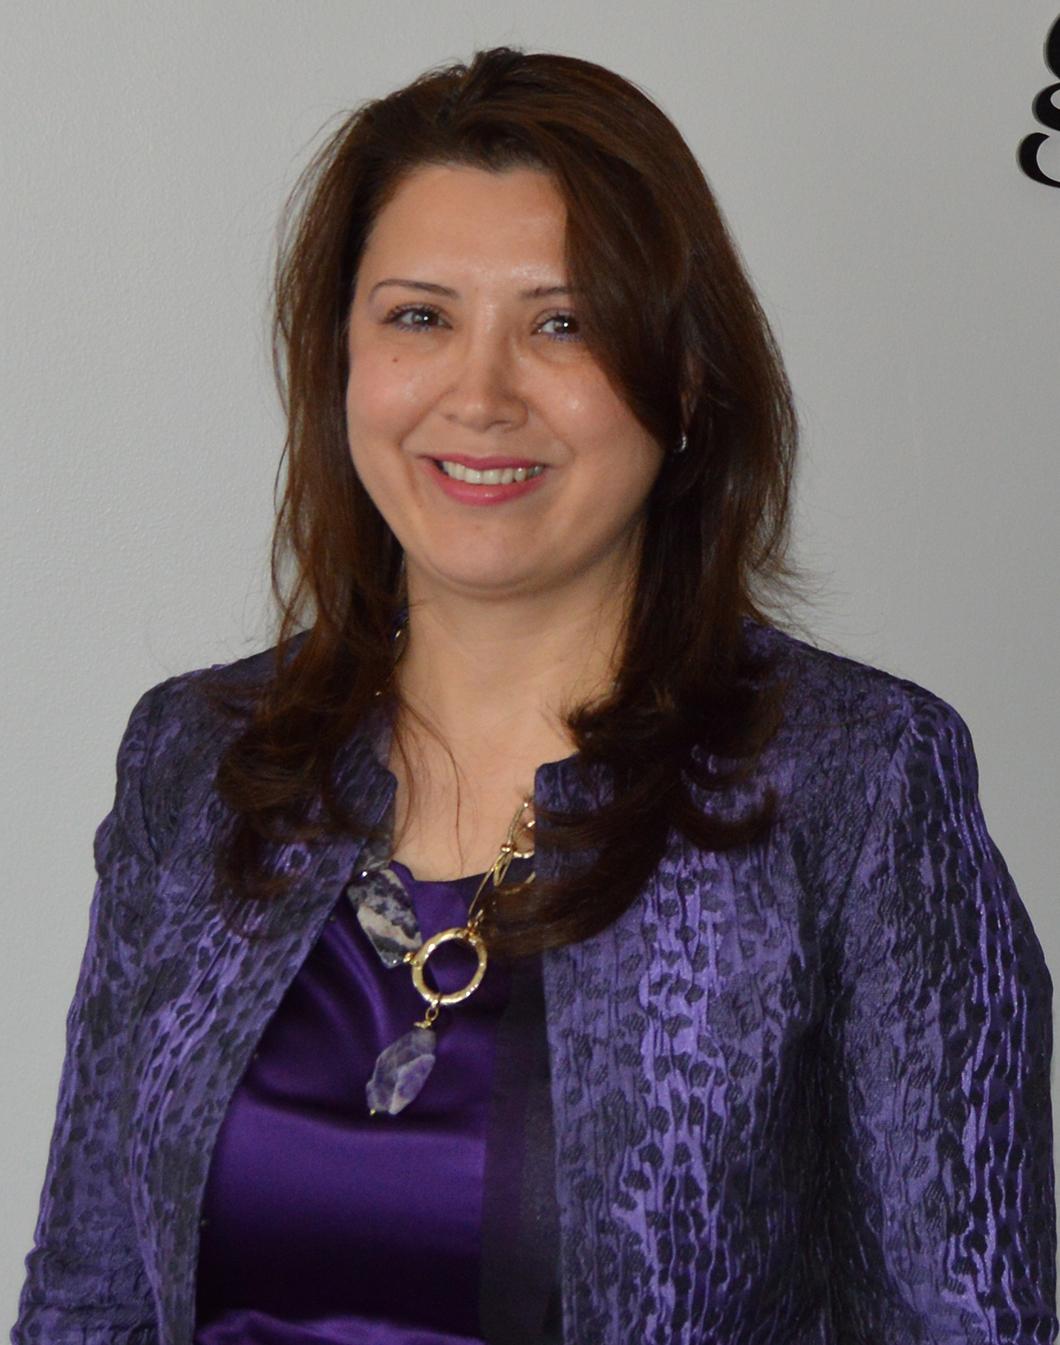 Berna Belkıs Şekerbank İK Grup Başkanı